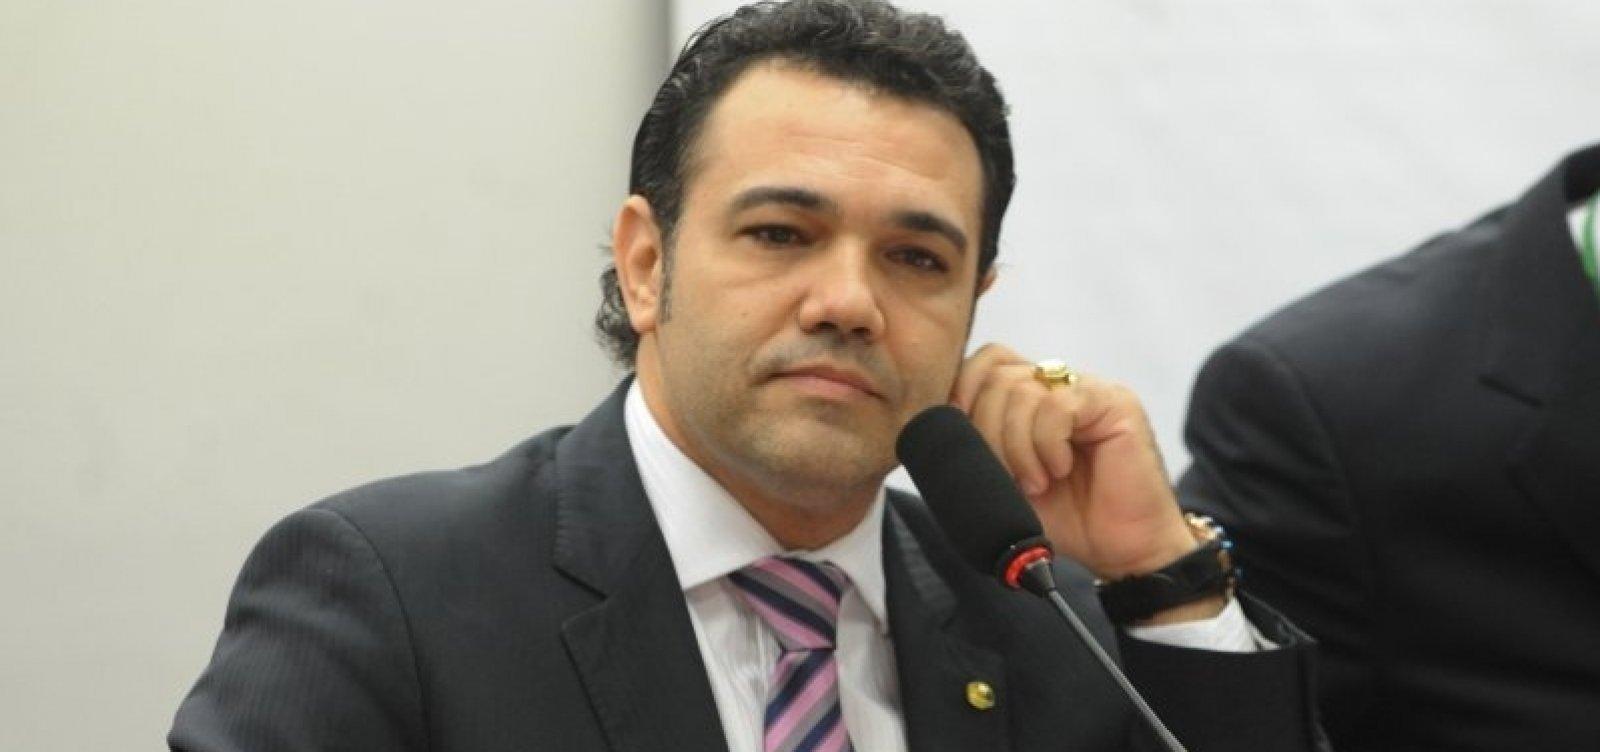 Bolsonaro escolhe Feliciano como interlocutor preferencial, diz coluna